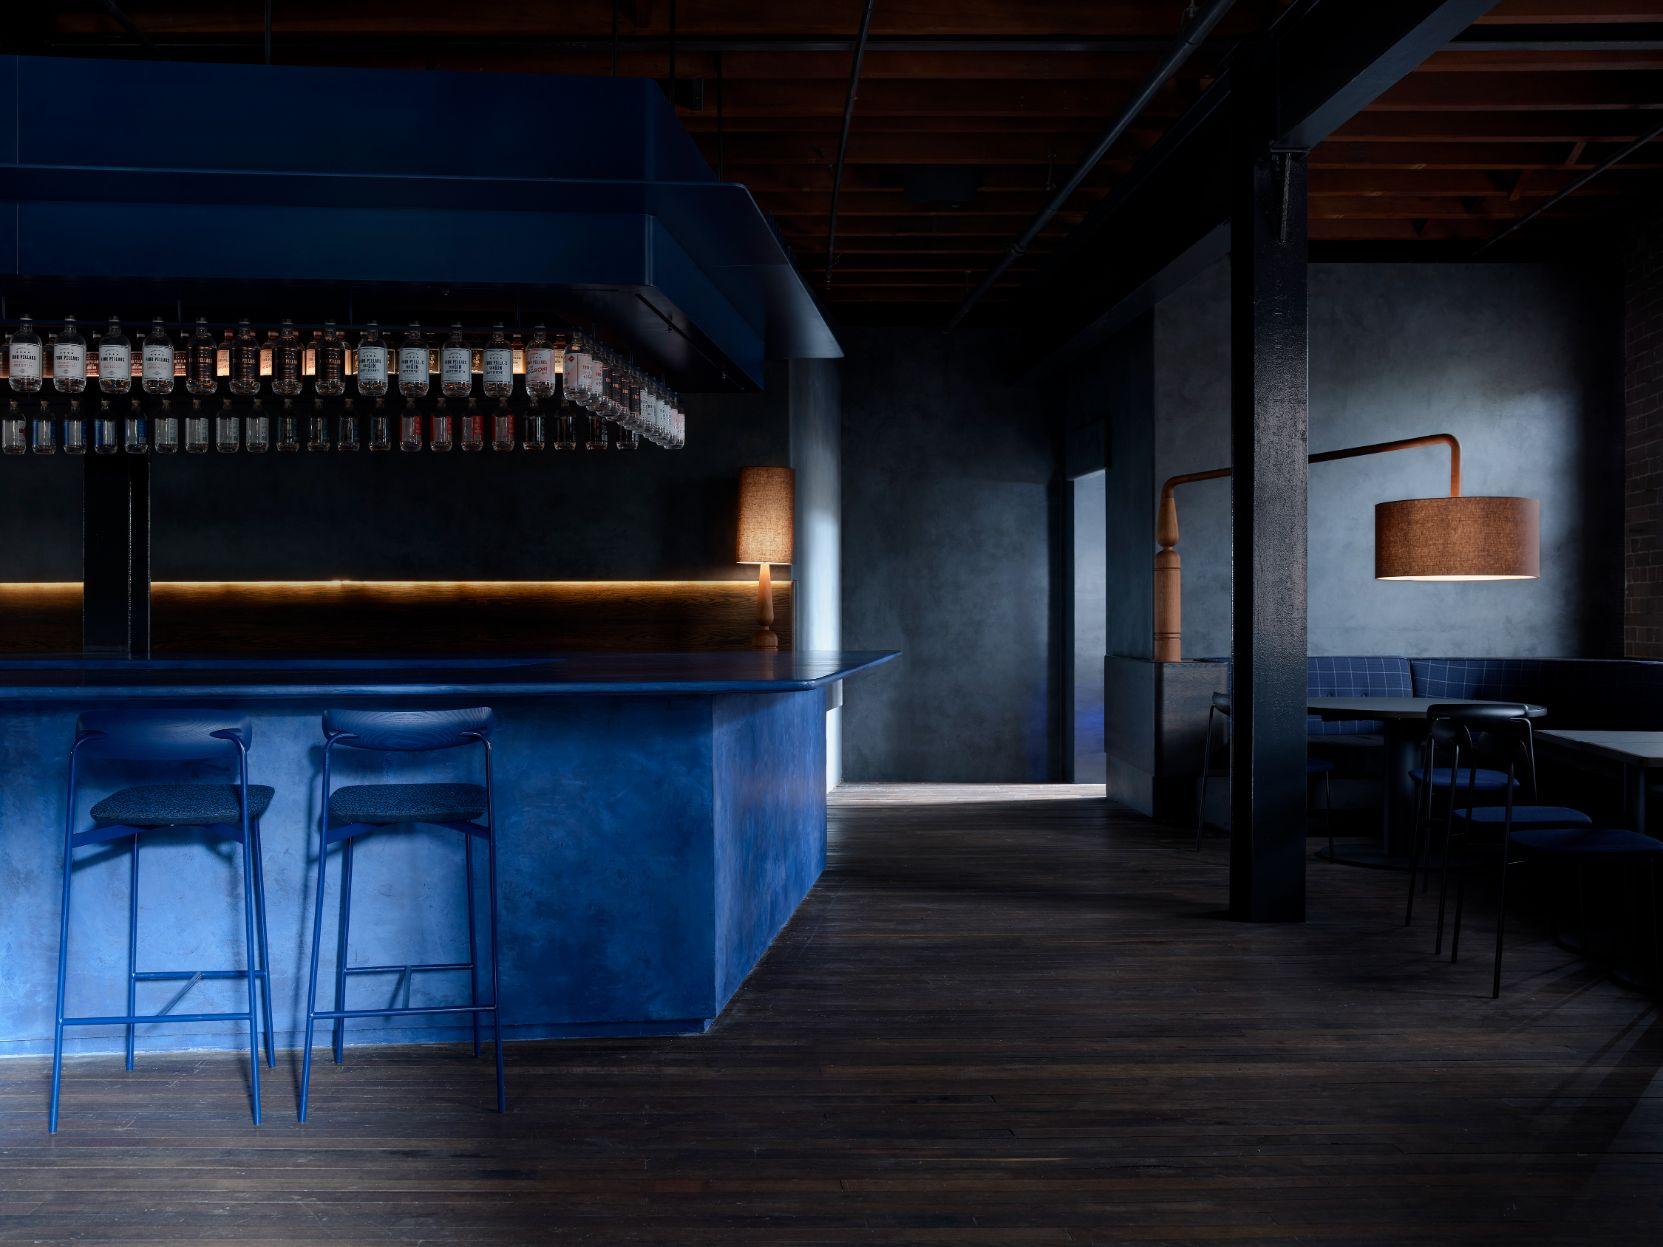 06_Four Pillars_Eileen_YSG Studio